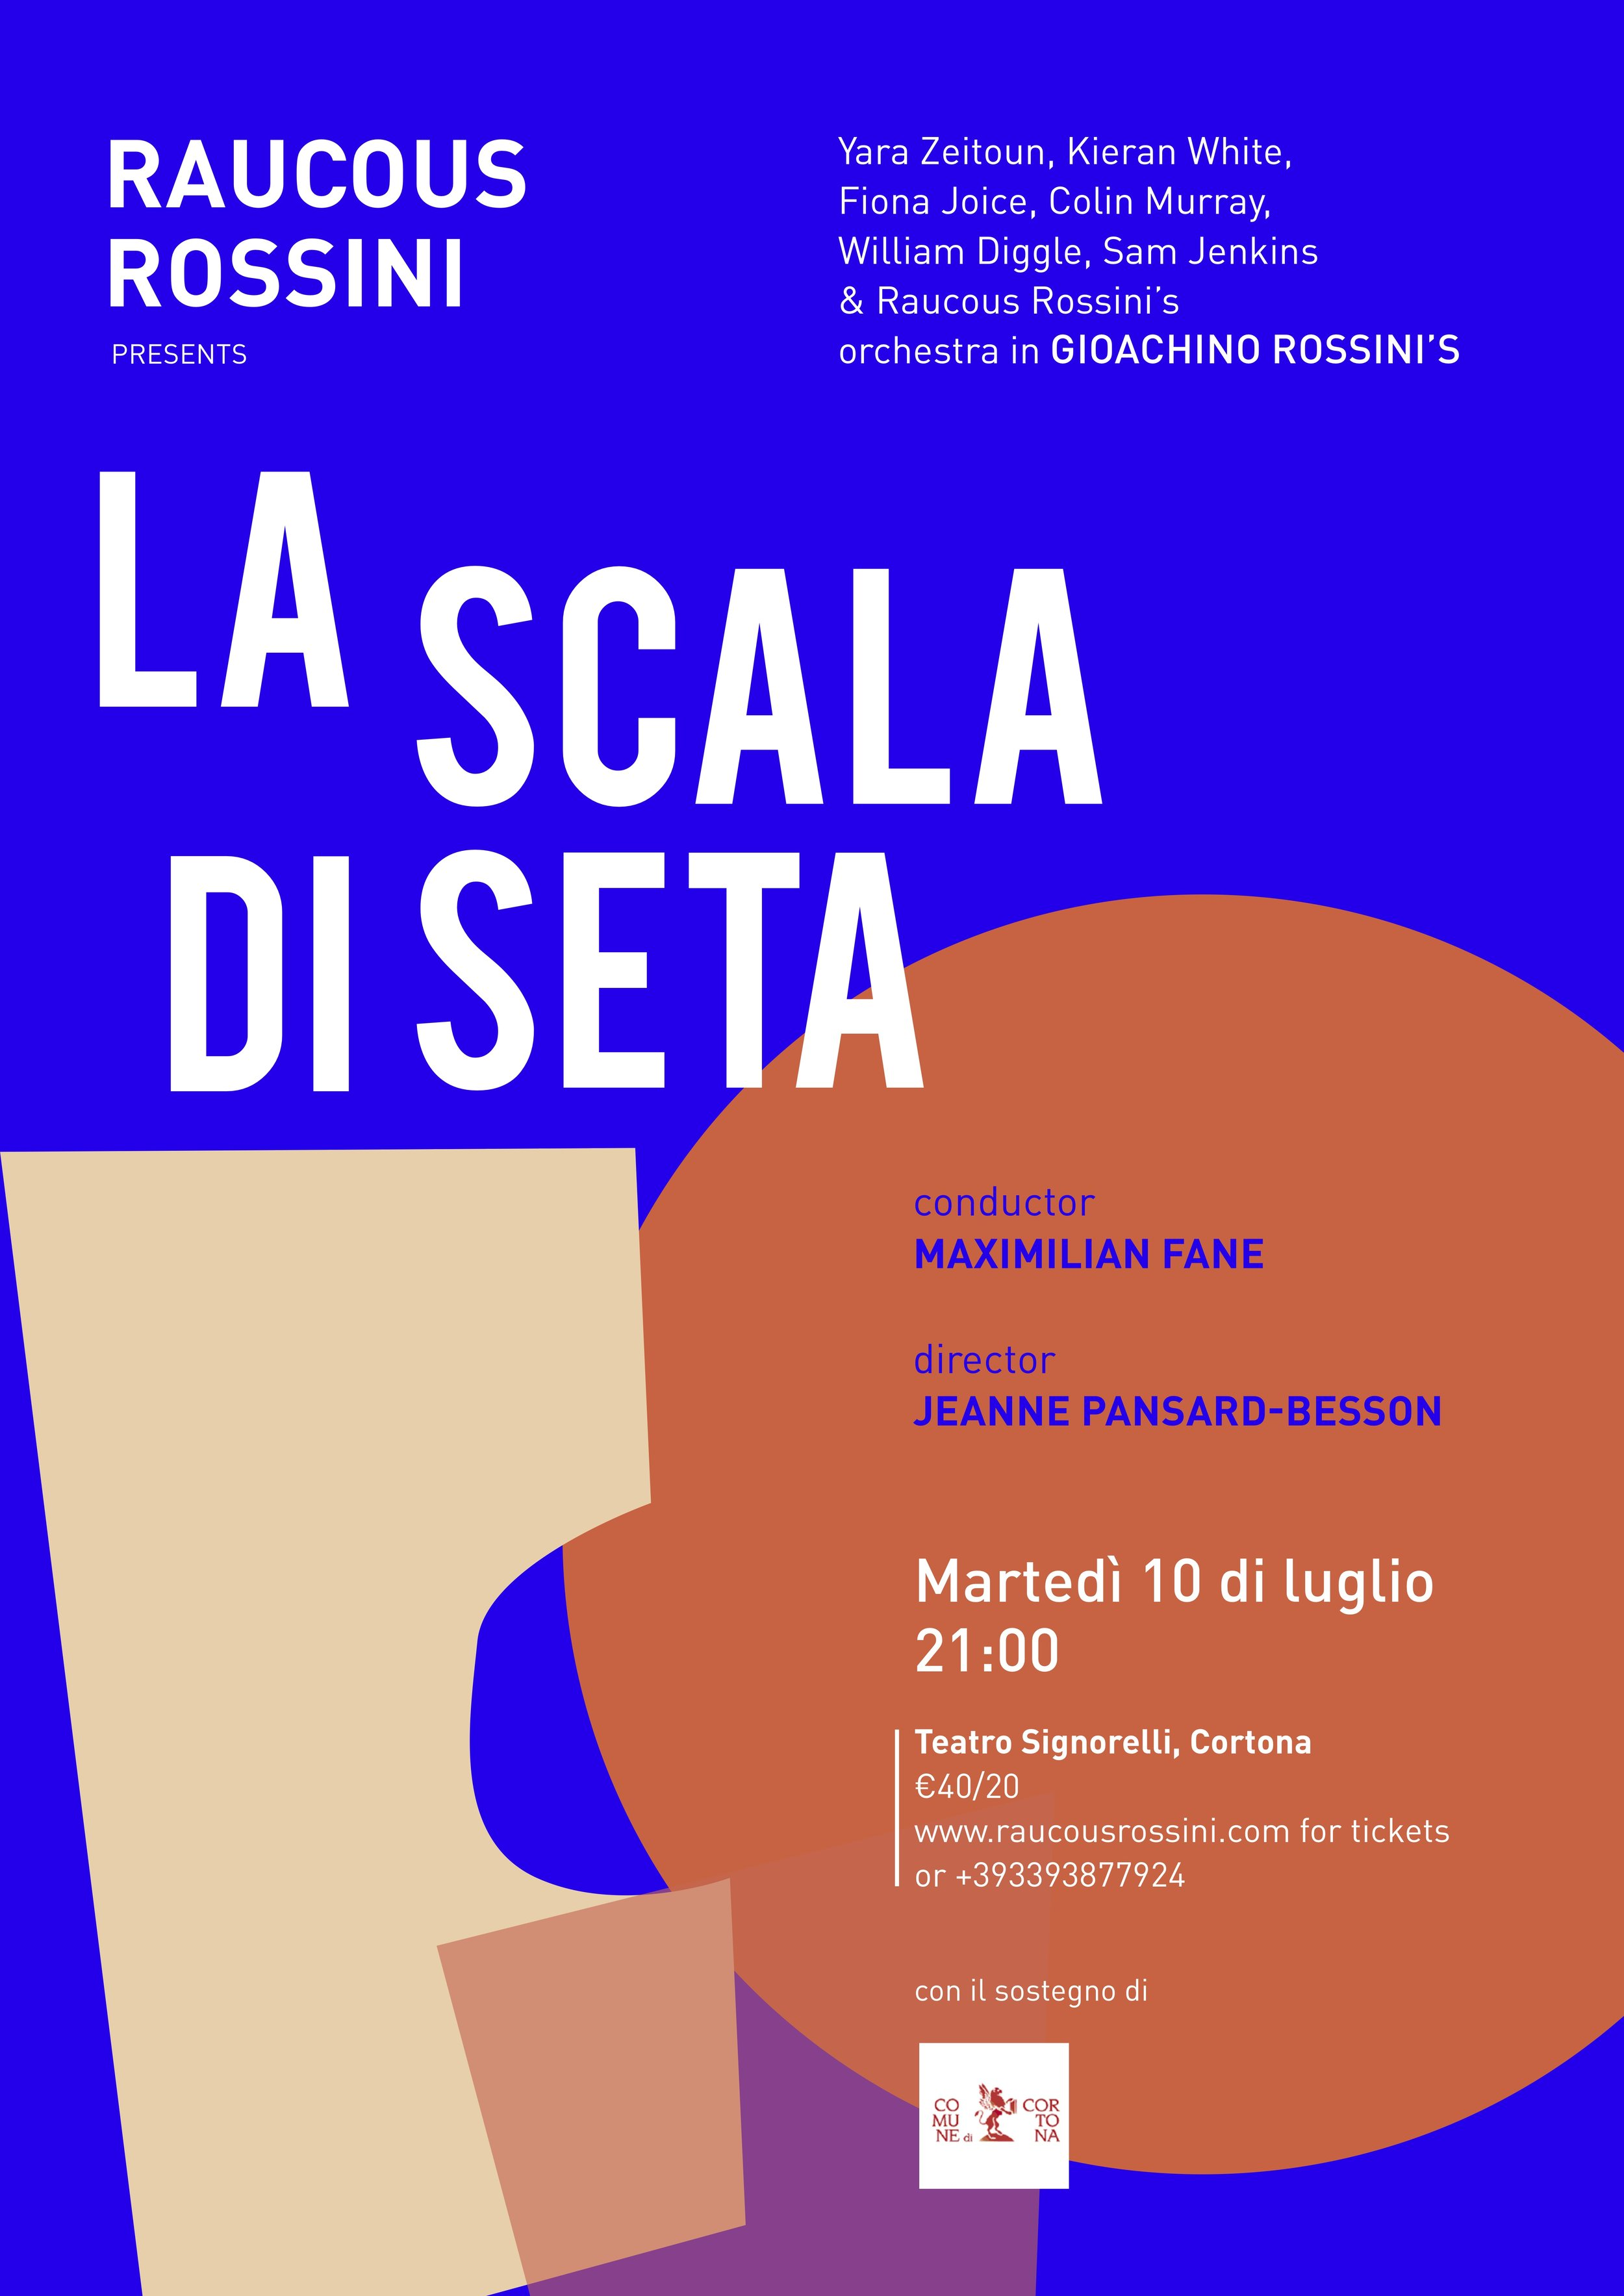 Poster Rossini Cortona.jpg